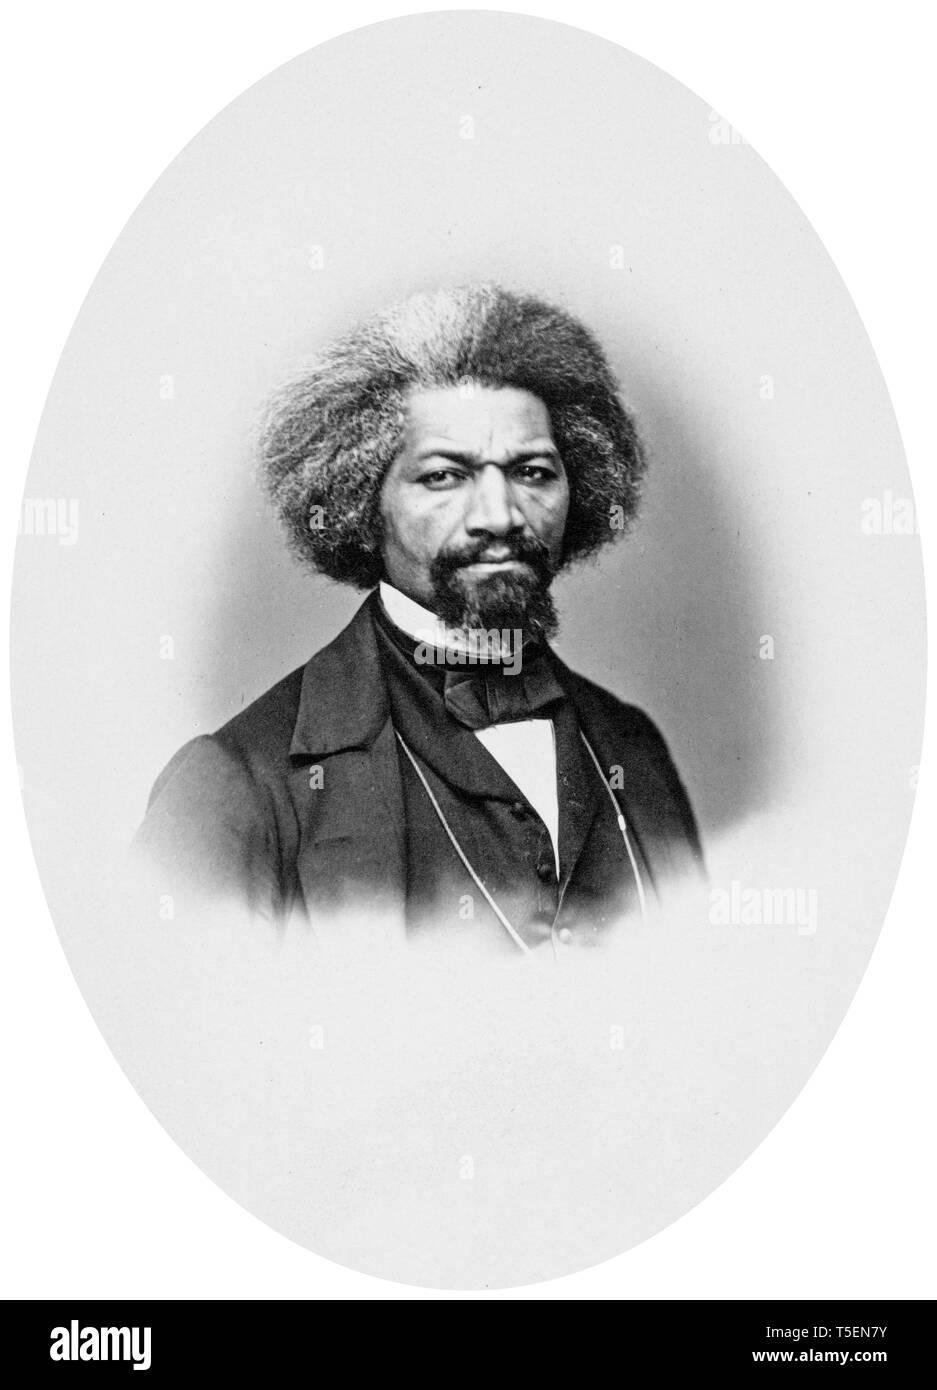 Frederick Douglass (1818-1895), portrait by John White Hurn, 1862 - Stock Image